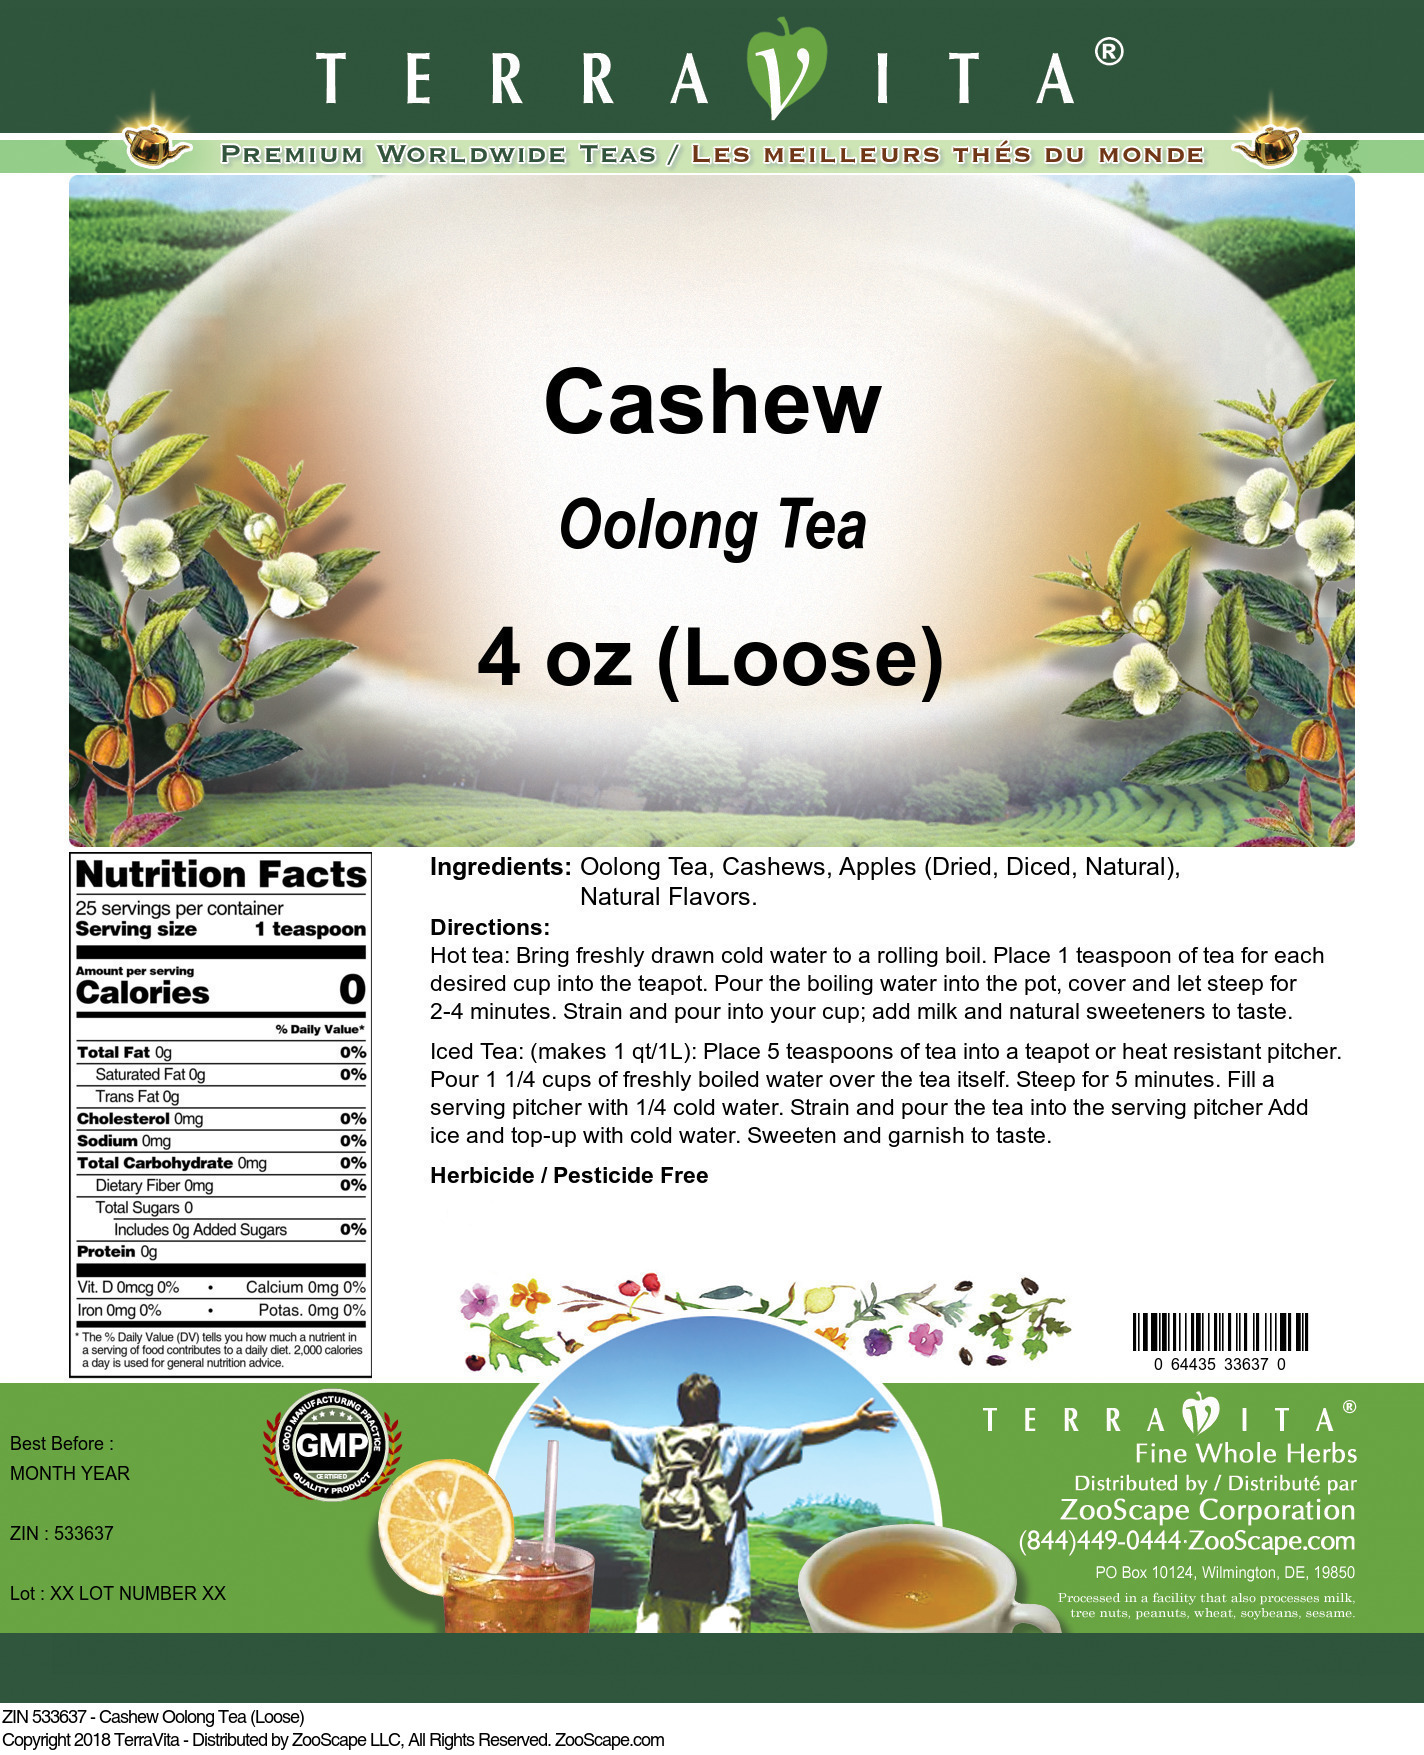 Cashew Oolong Tea